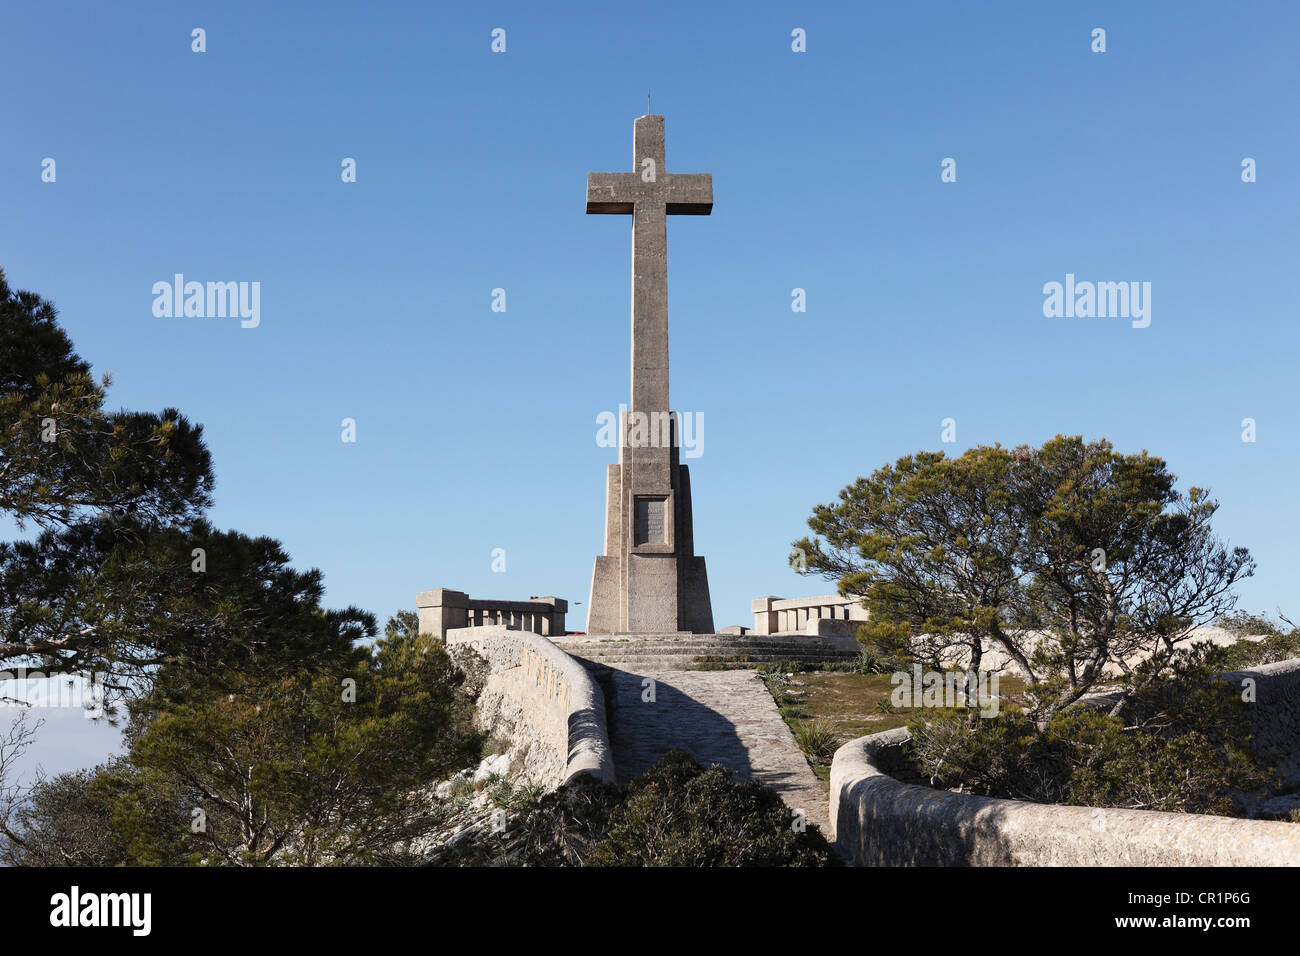 Cross at the Puig de San Salvador, Felanitx, Majorca, Balearic Islands, Spain, Europe - Stock Image